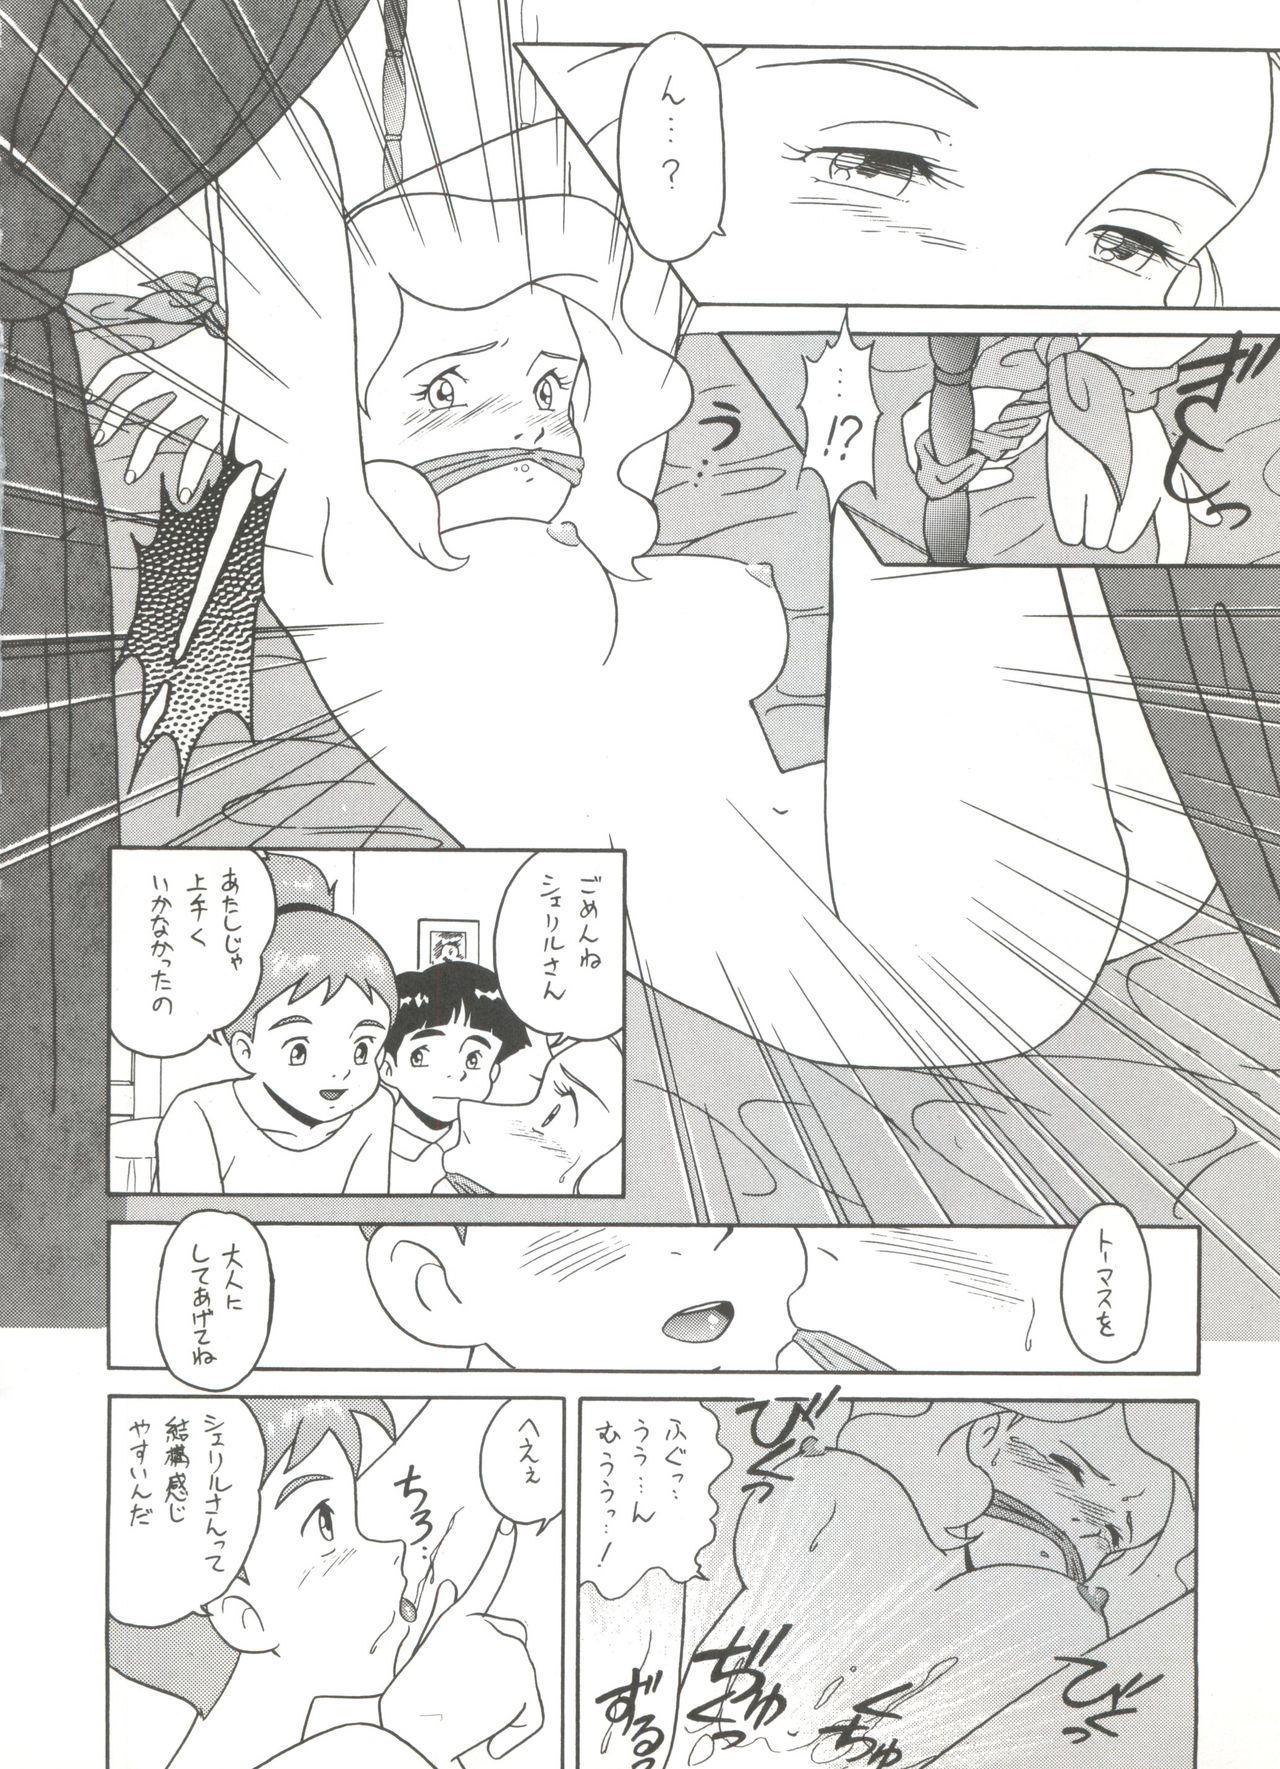 Hara Hara Dokei Vol. 4 Quattro 80